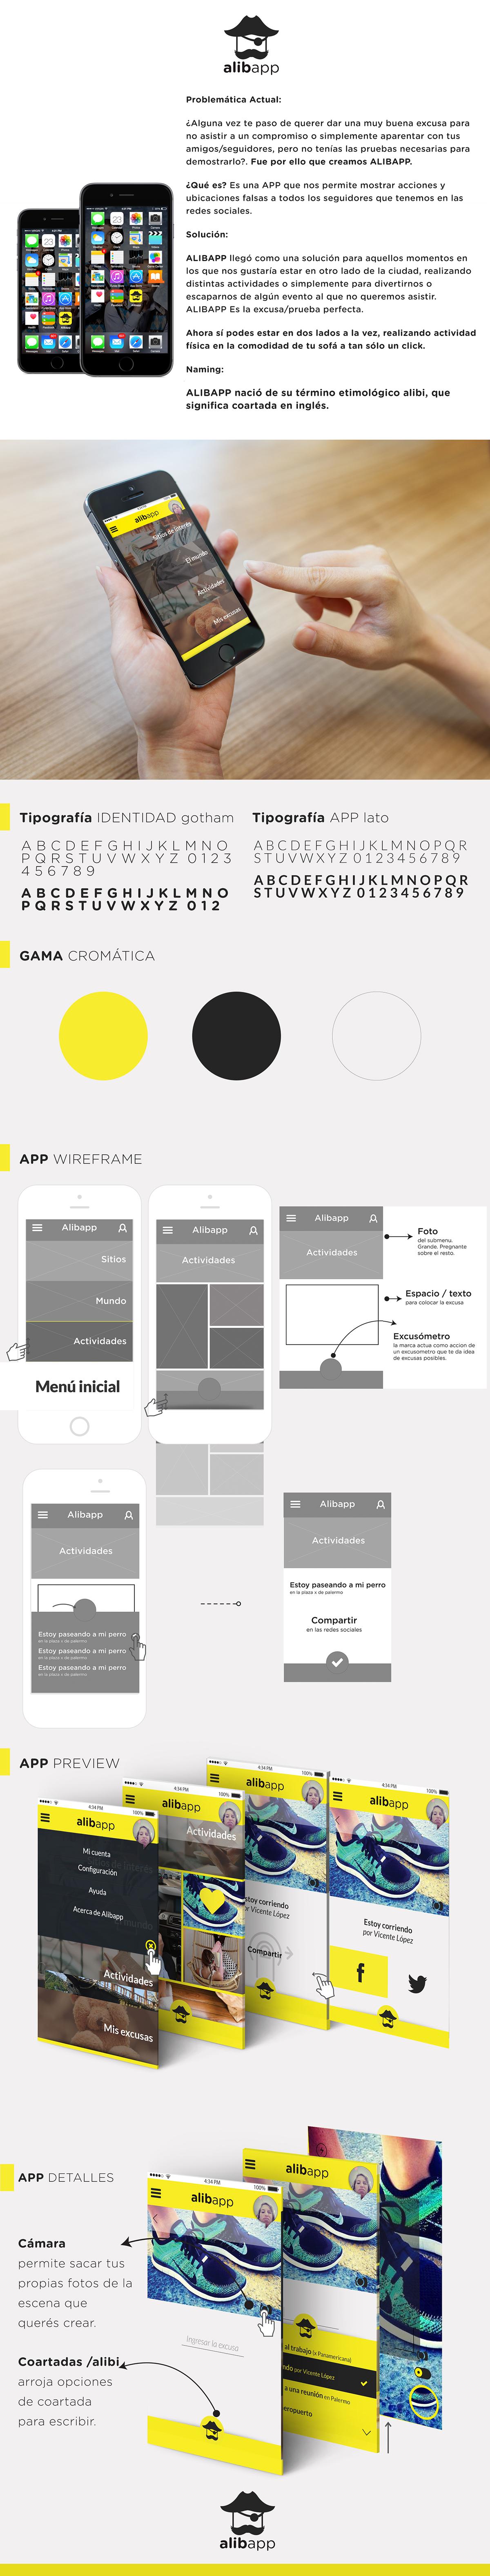 diseño UI ux Alibi ALIBAPP